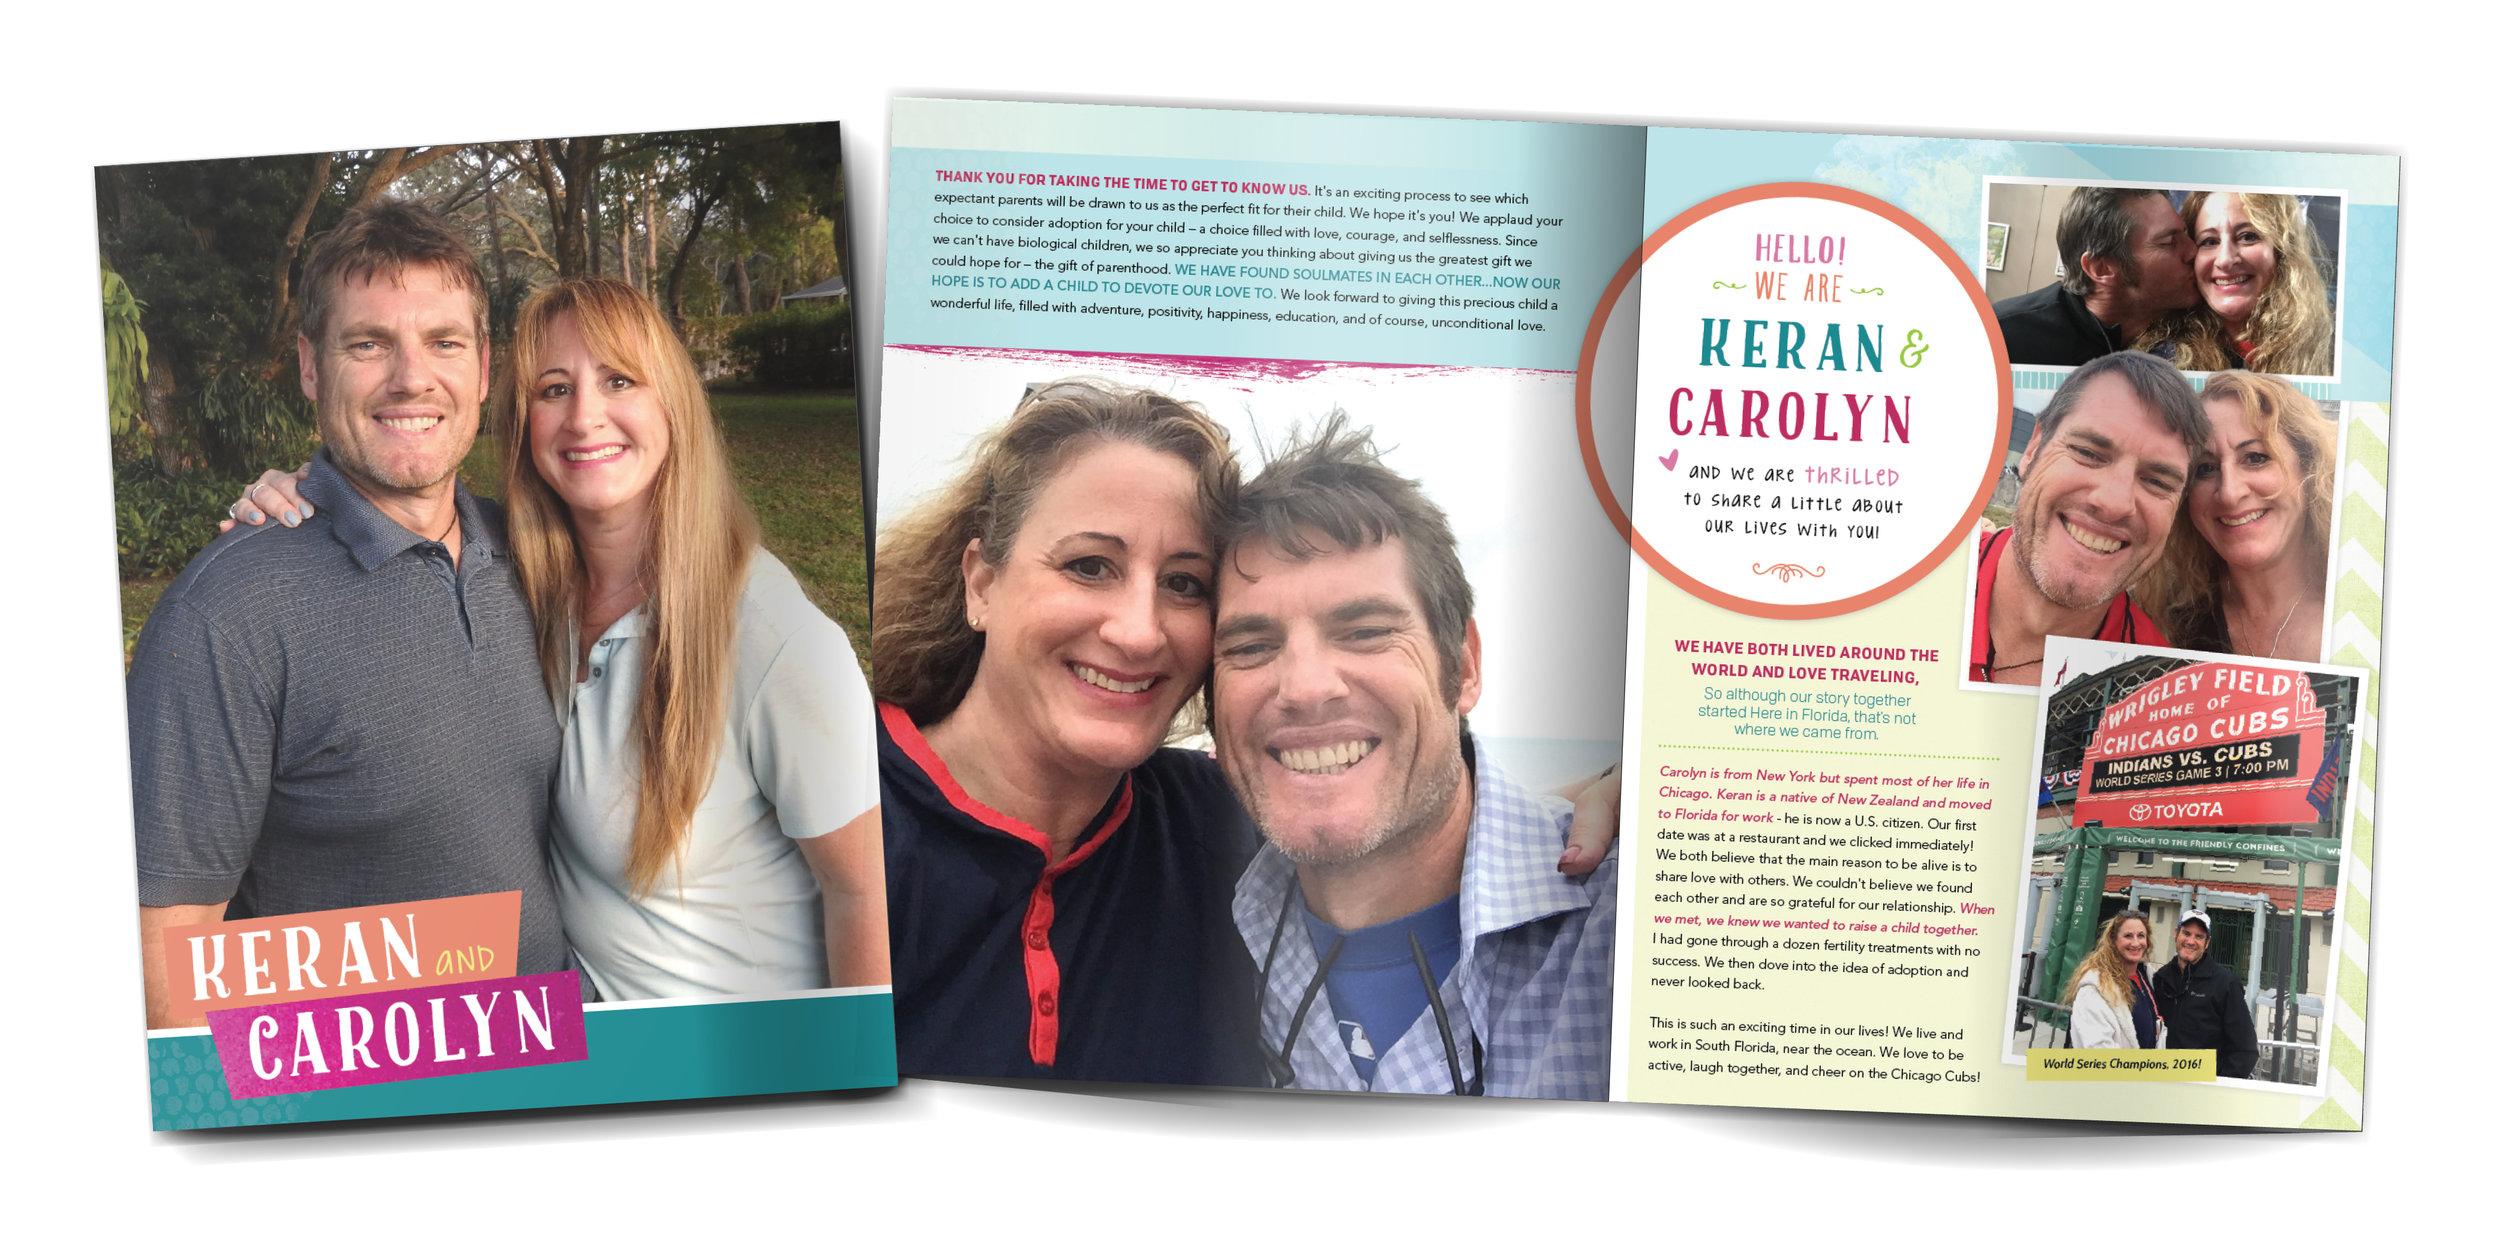 Carolyn and Keran adopt